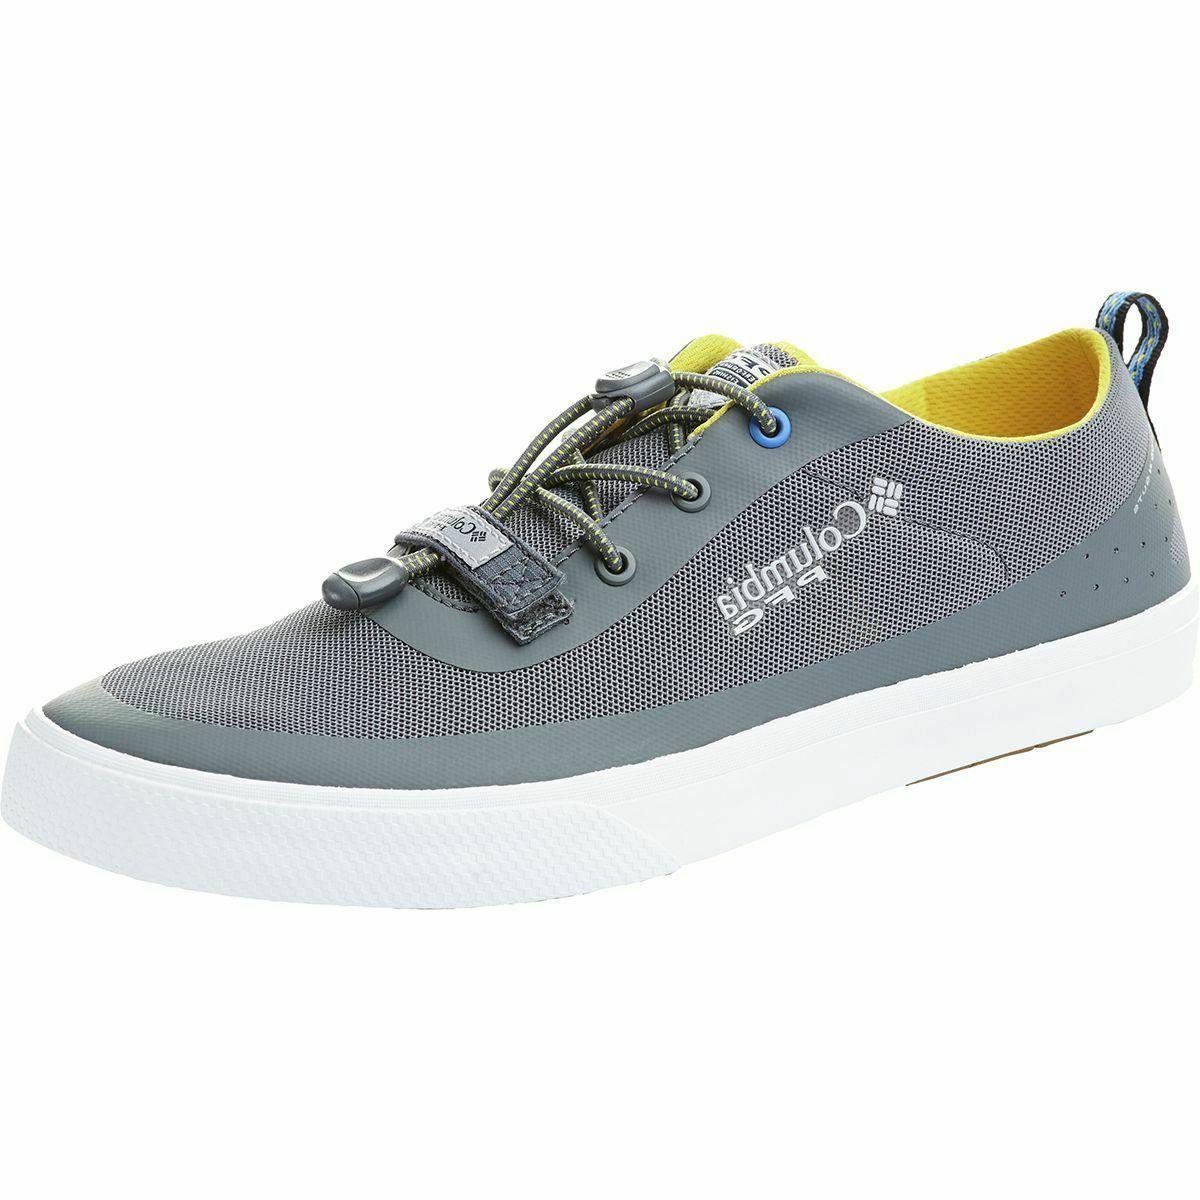 mens water shoes gray dorado pfg cvo